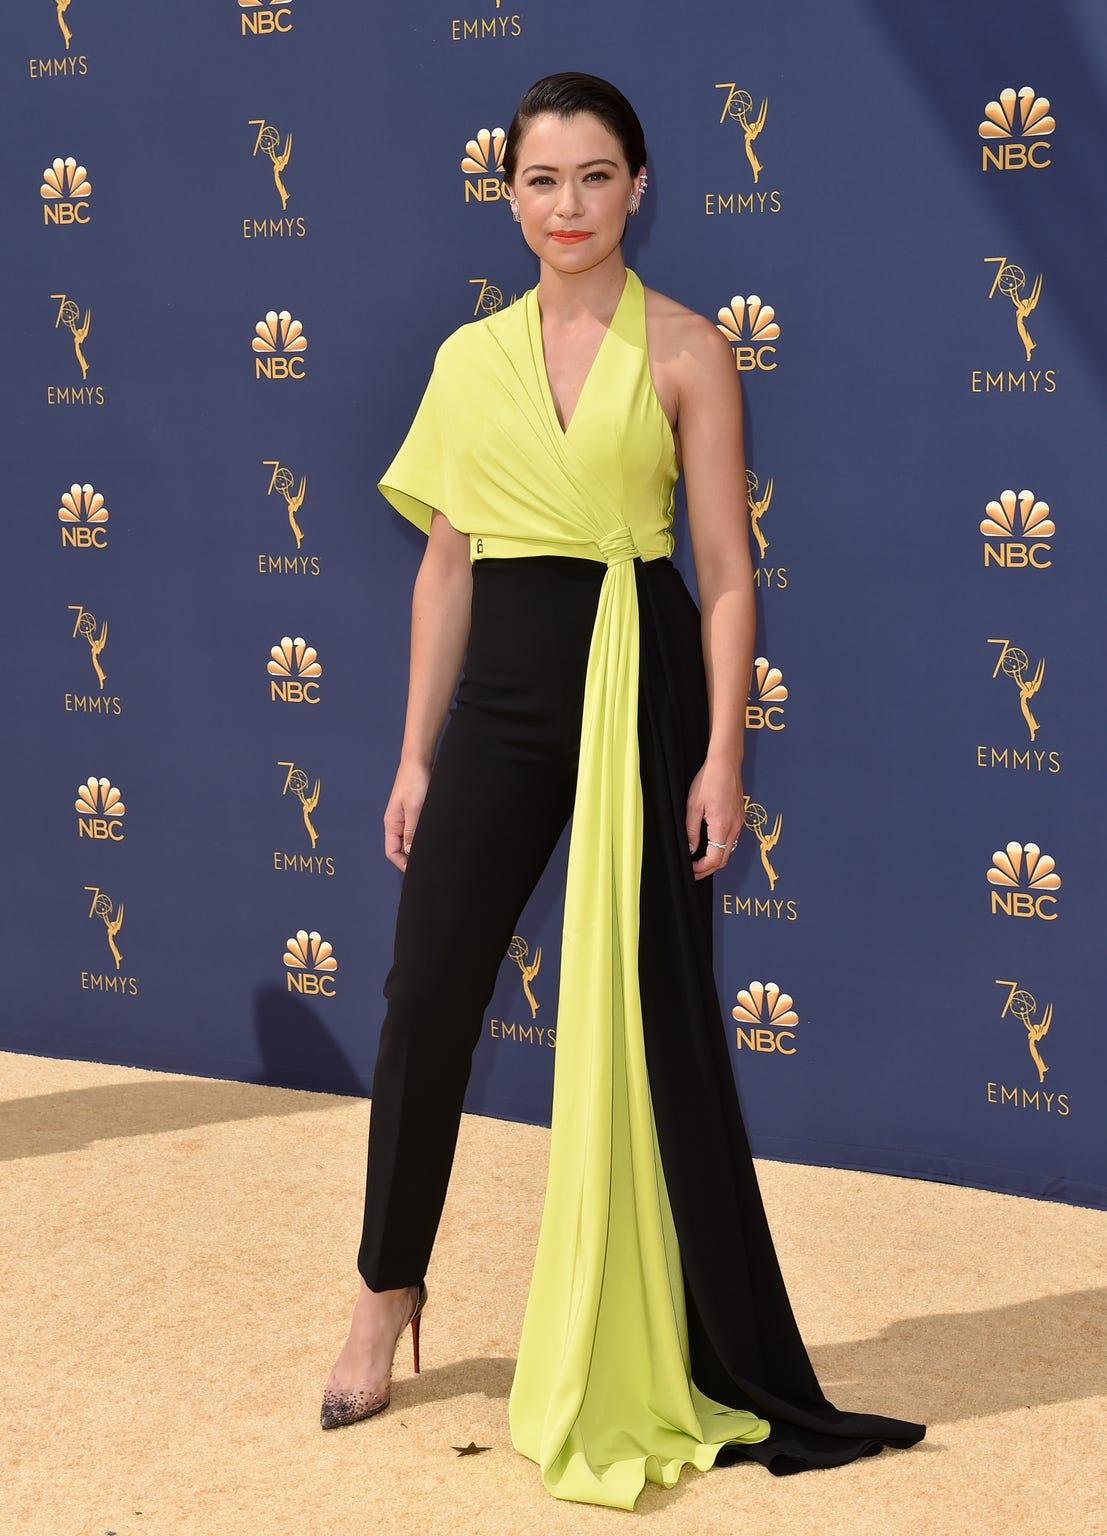 Tatiana Maslany attended the Emmy Awards on September 17, 2018.